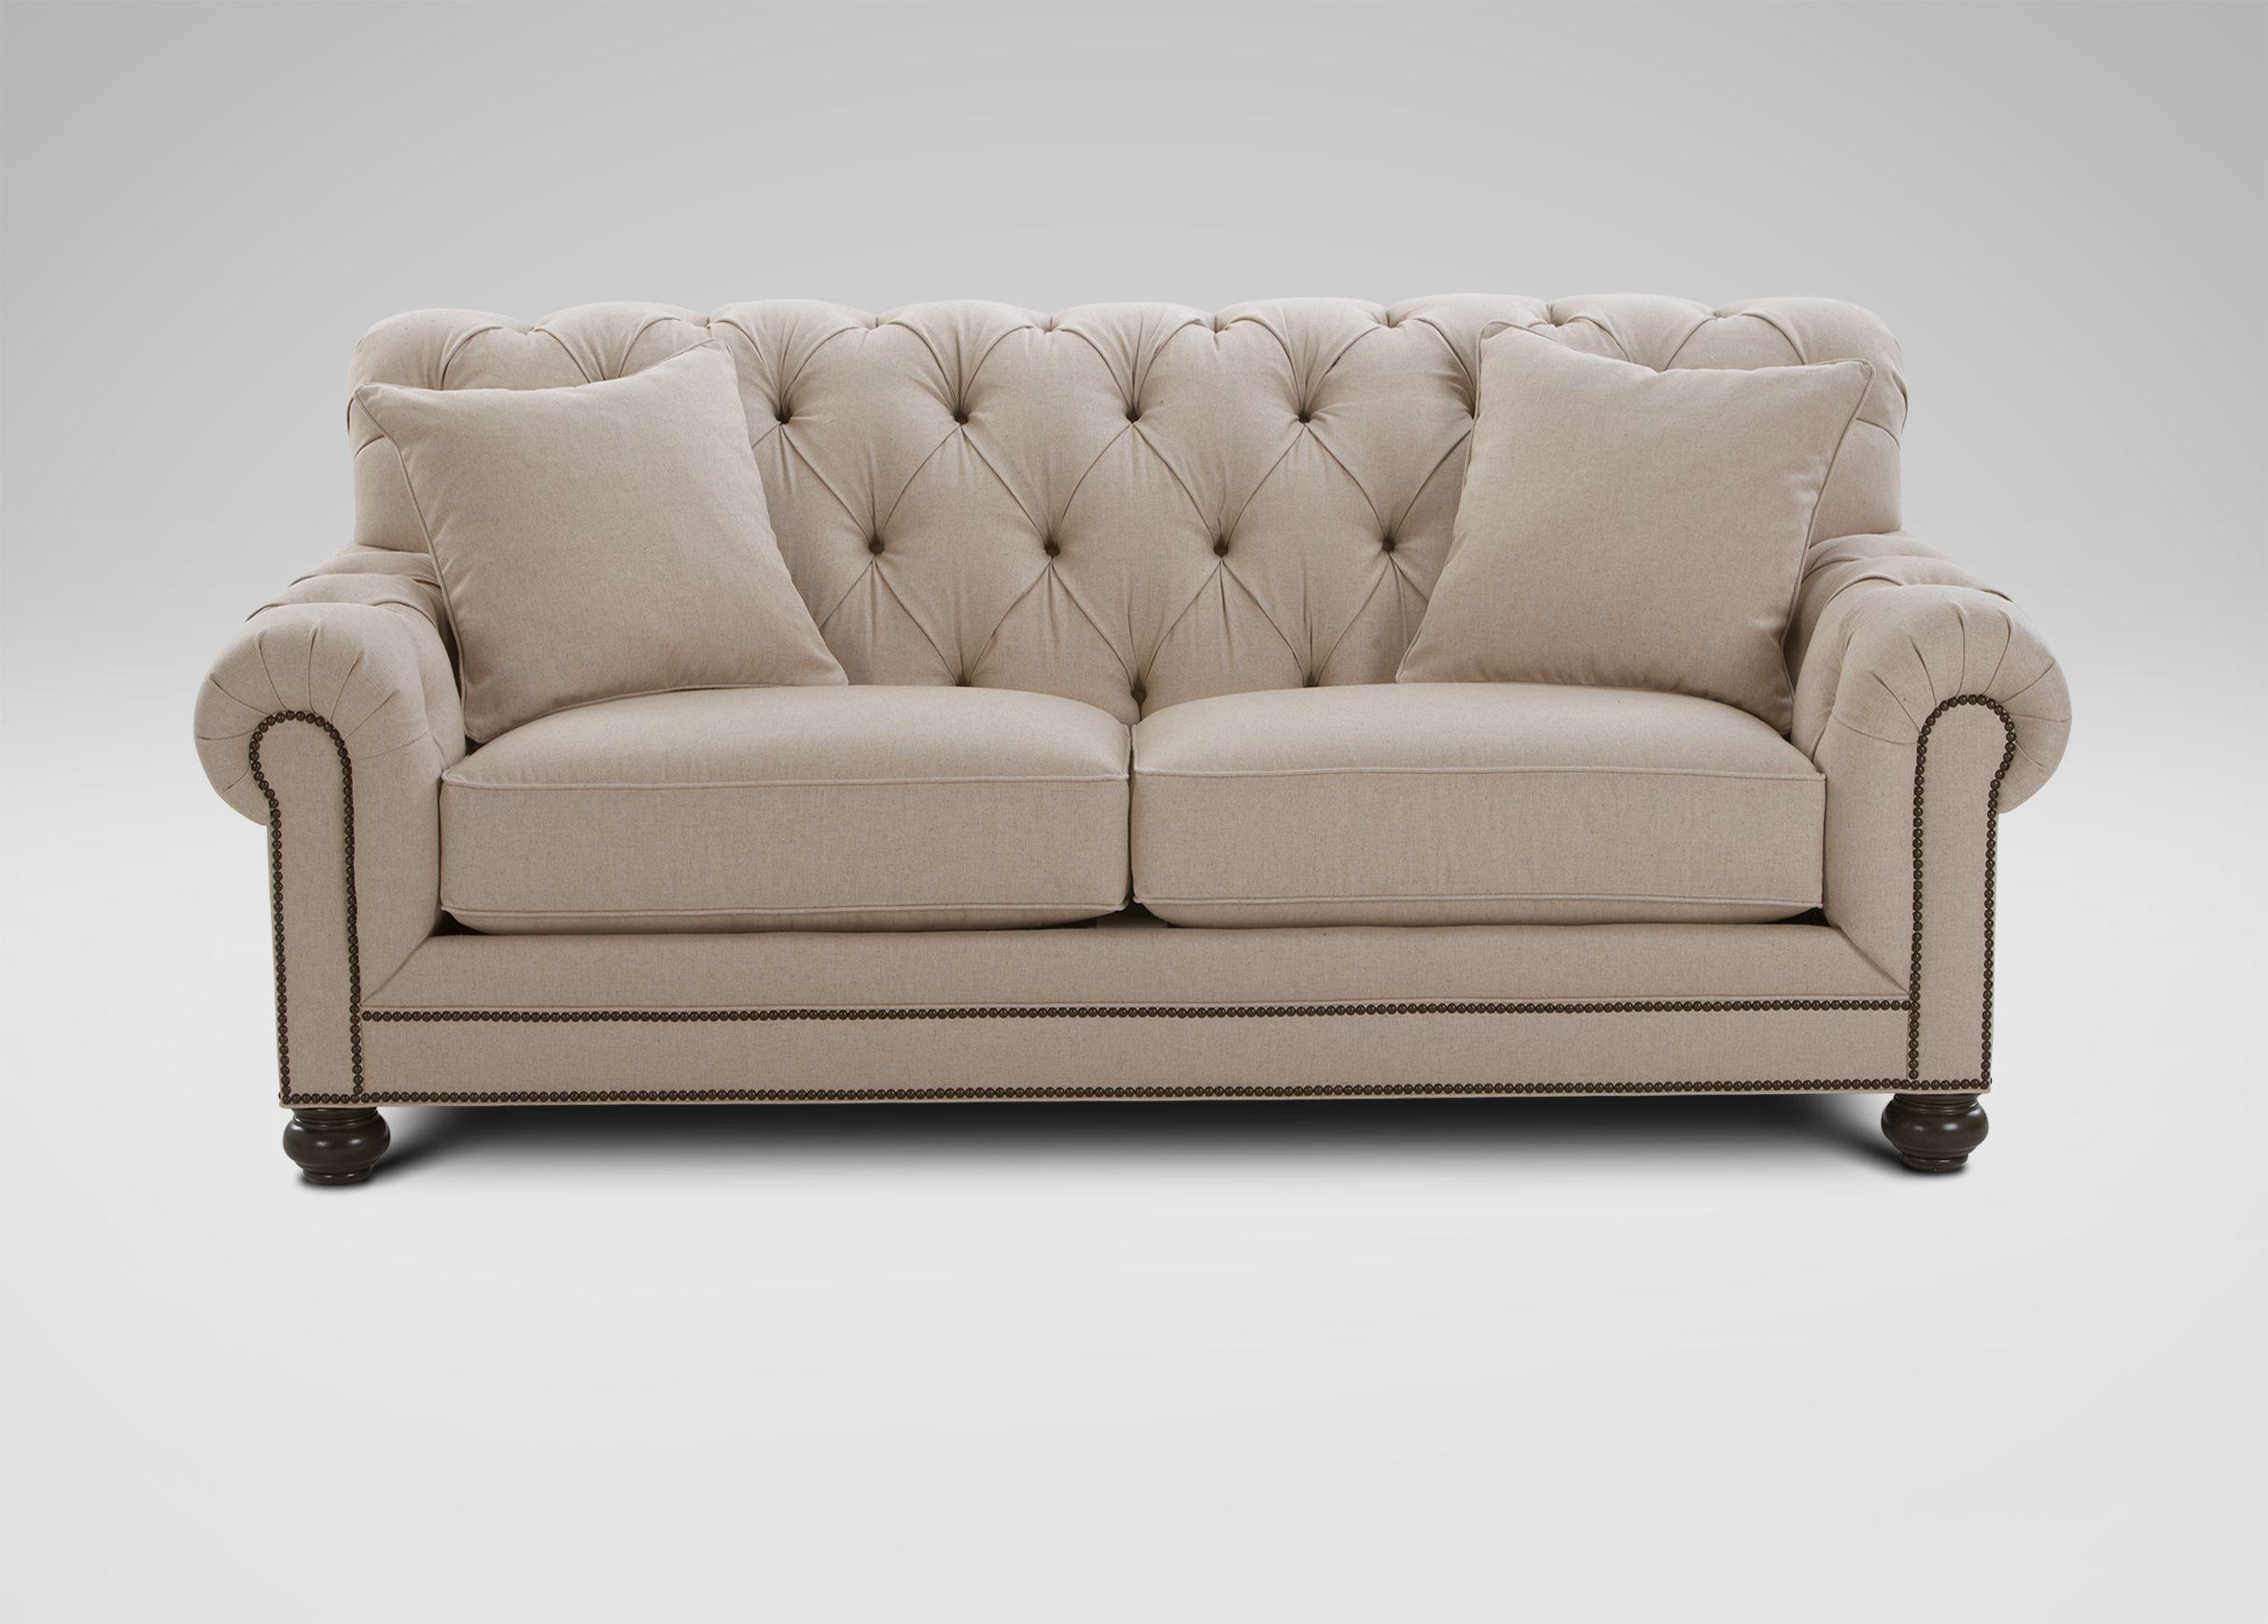 Martha Stewart Sofa Saybridge Review Sleeper Walmart Ethan Allen Chadwick Caron Linen For The Home